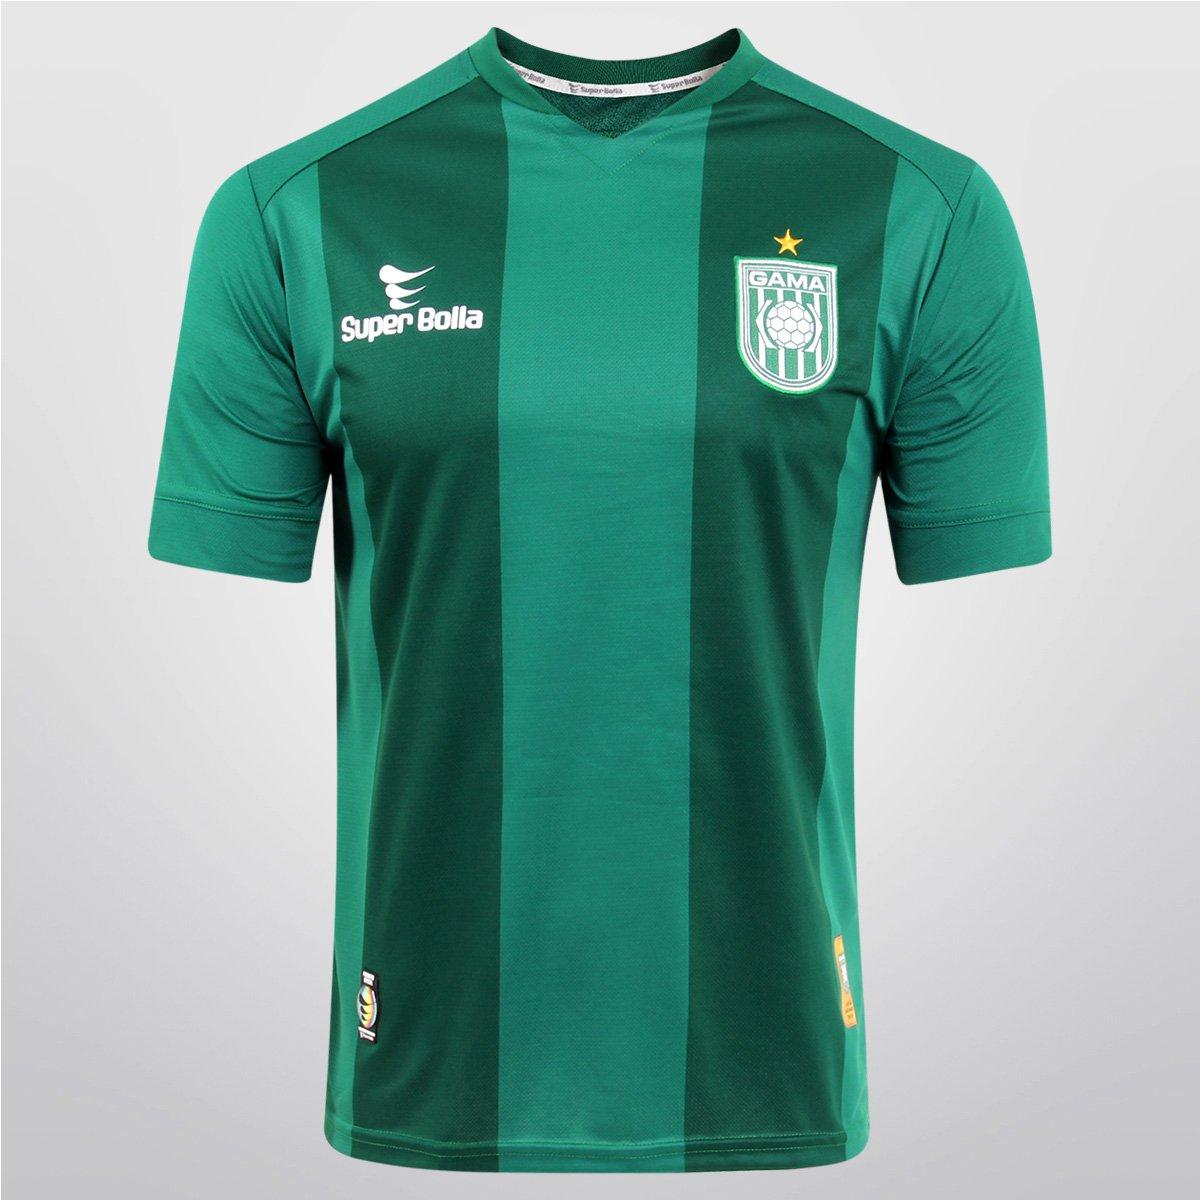 Camisa Super Bolla Gama I 2015 nº 10 - Jogador - Compre Agora  171117da389ea